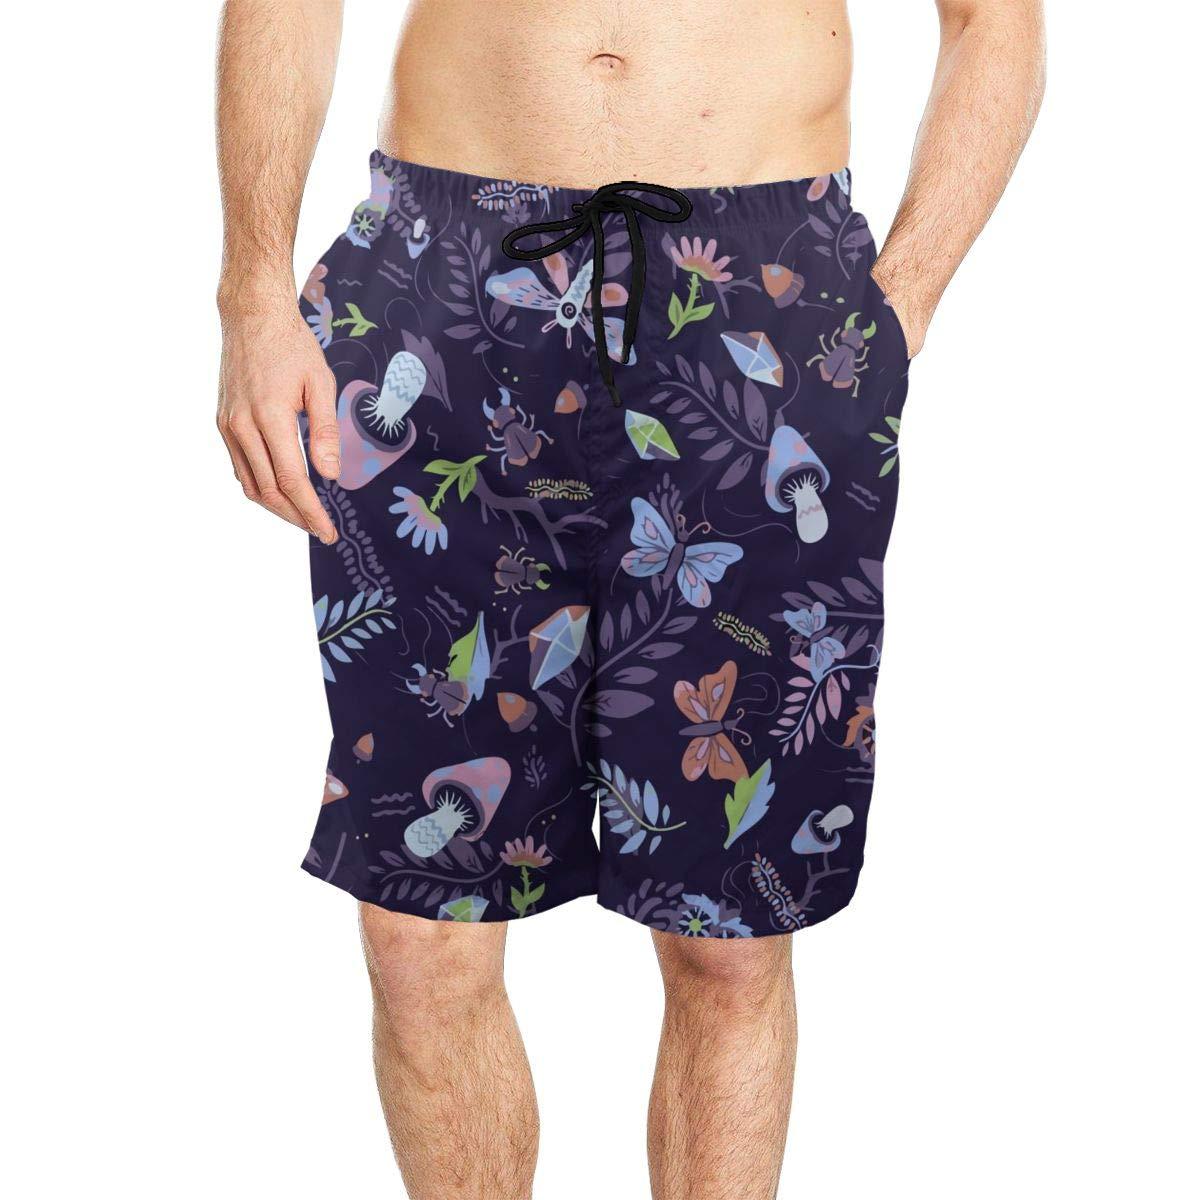 Ling Lake Shroomy Forest Night Mens Beach Shorts Board Shorts Summer Swim Trunks